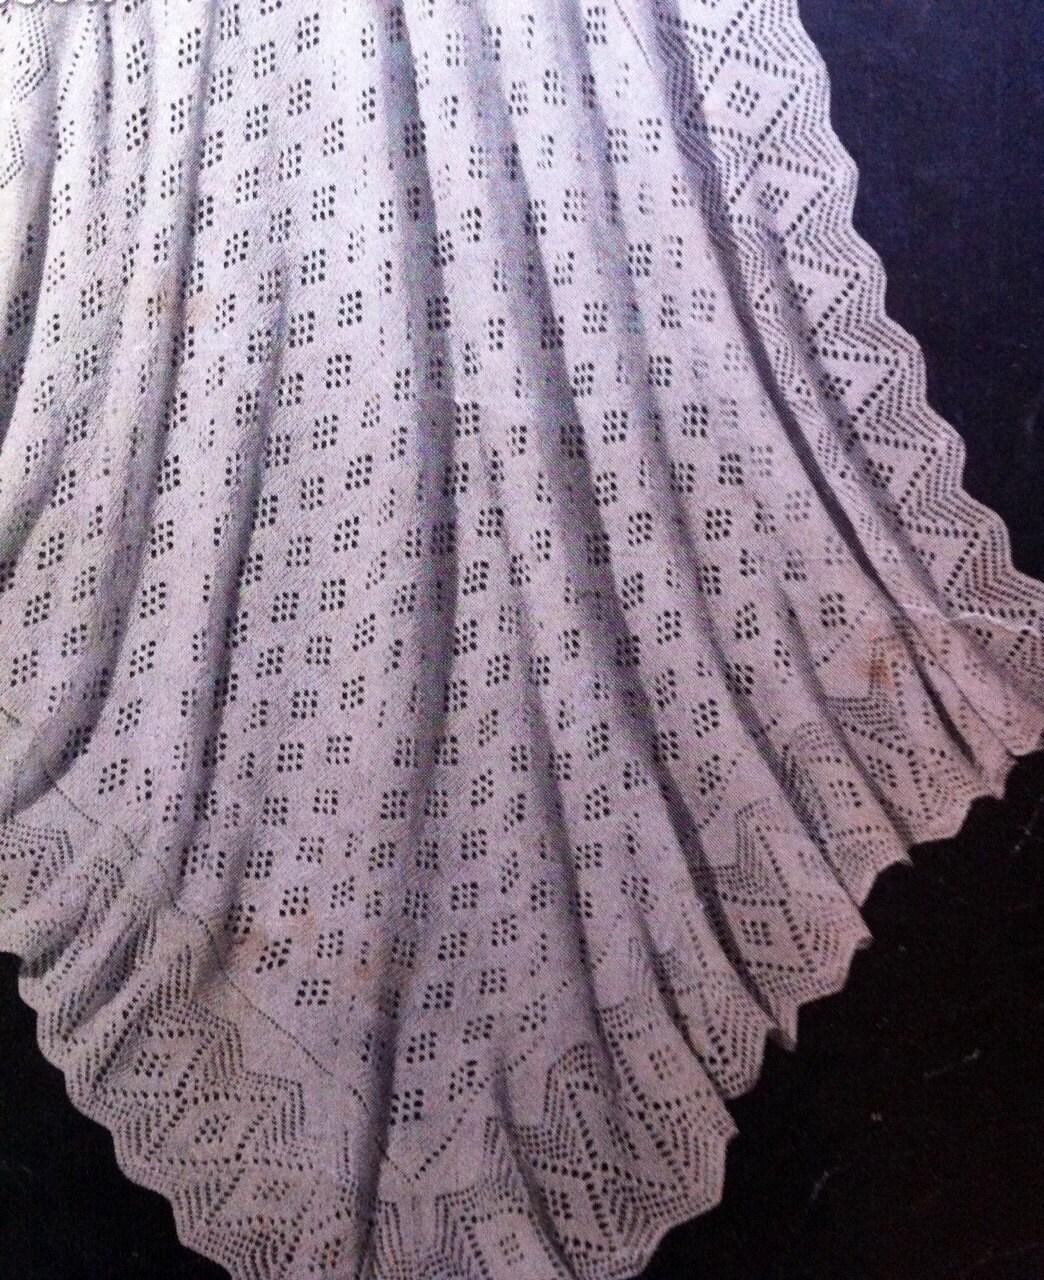 Rockabye baby blanket Australian Knitting epattern 1940s